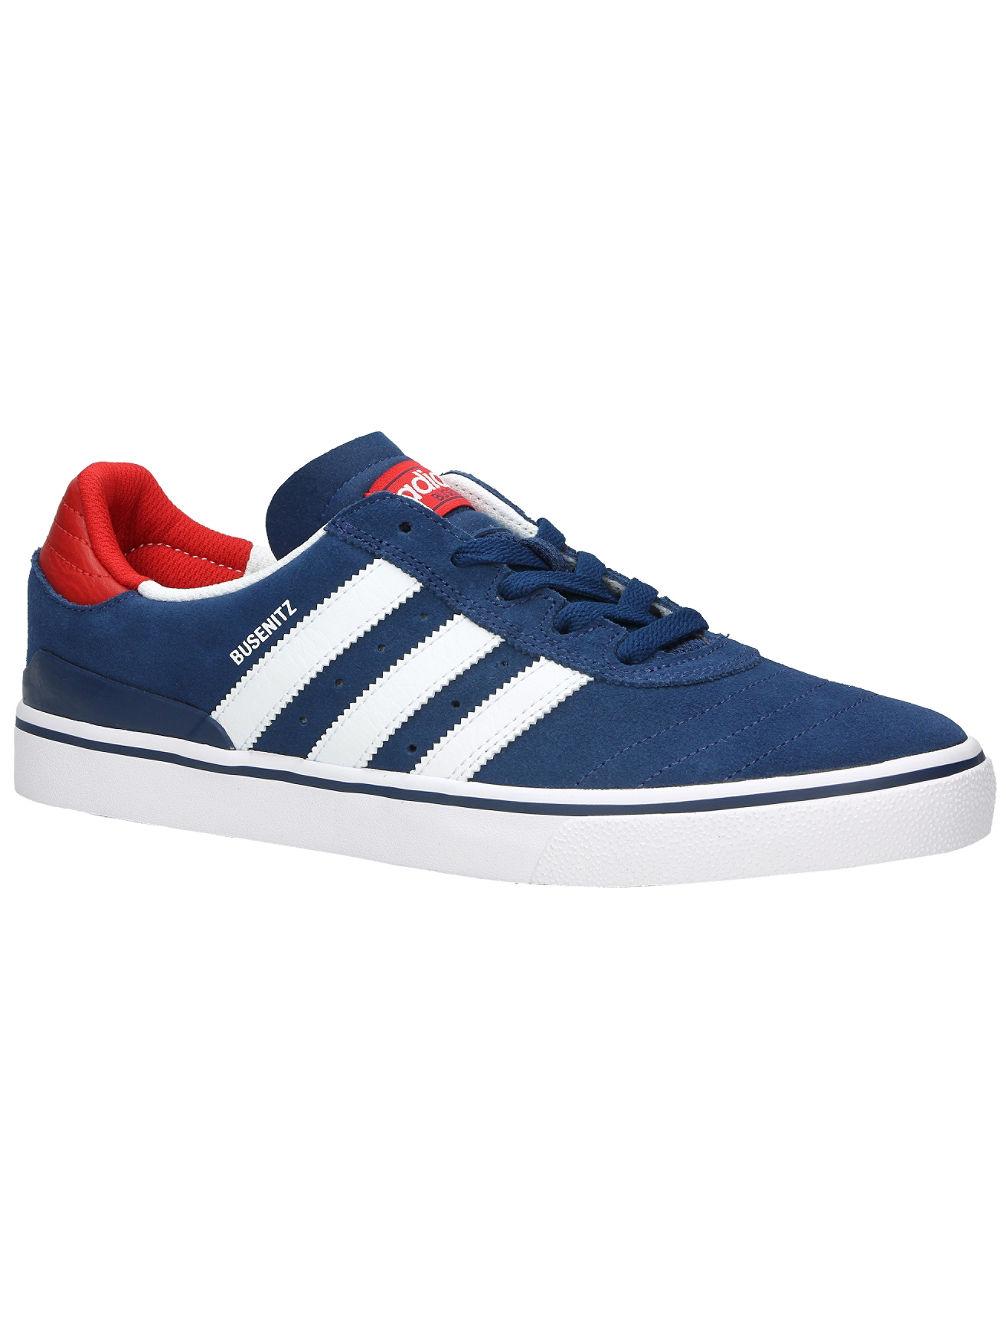 2b0ba211a3b8 Buy adidas Skateboarding Busenitz Vulc ADV Skate Shoes online at ...